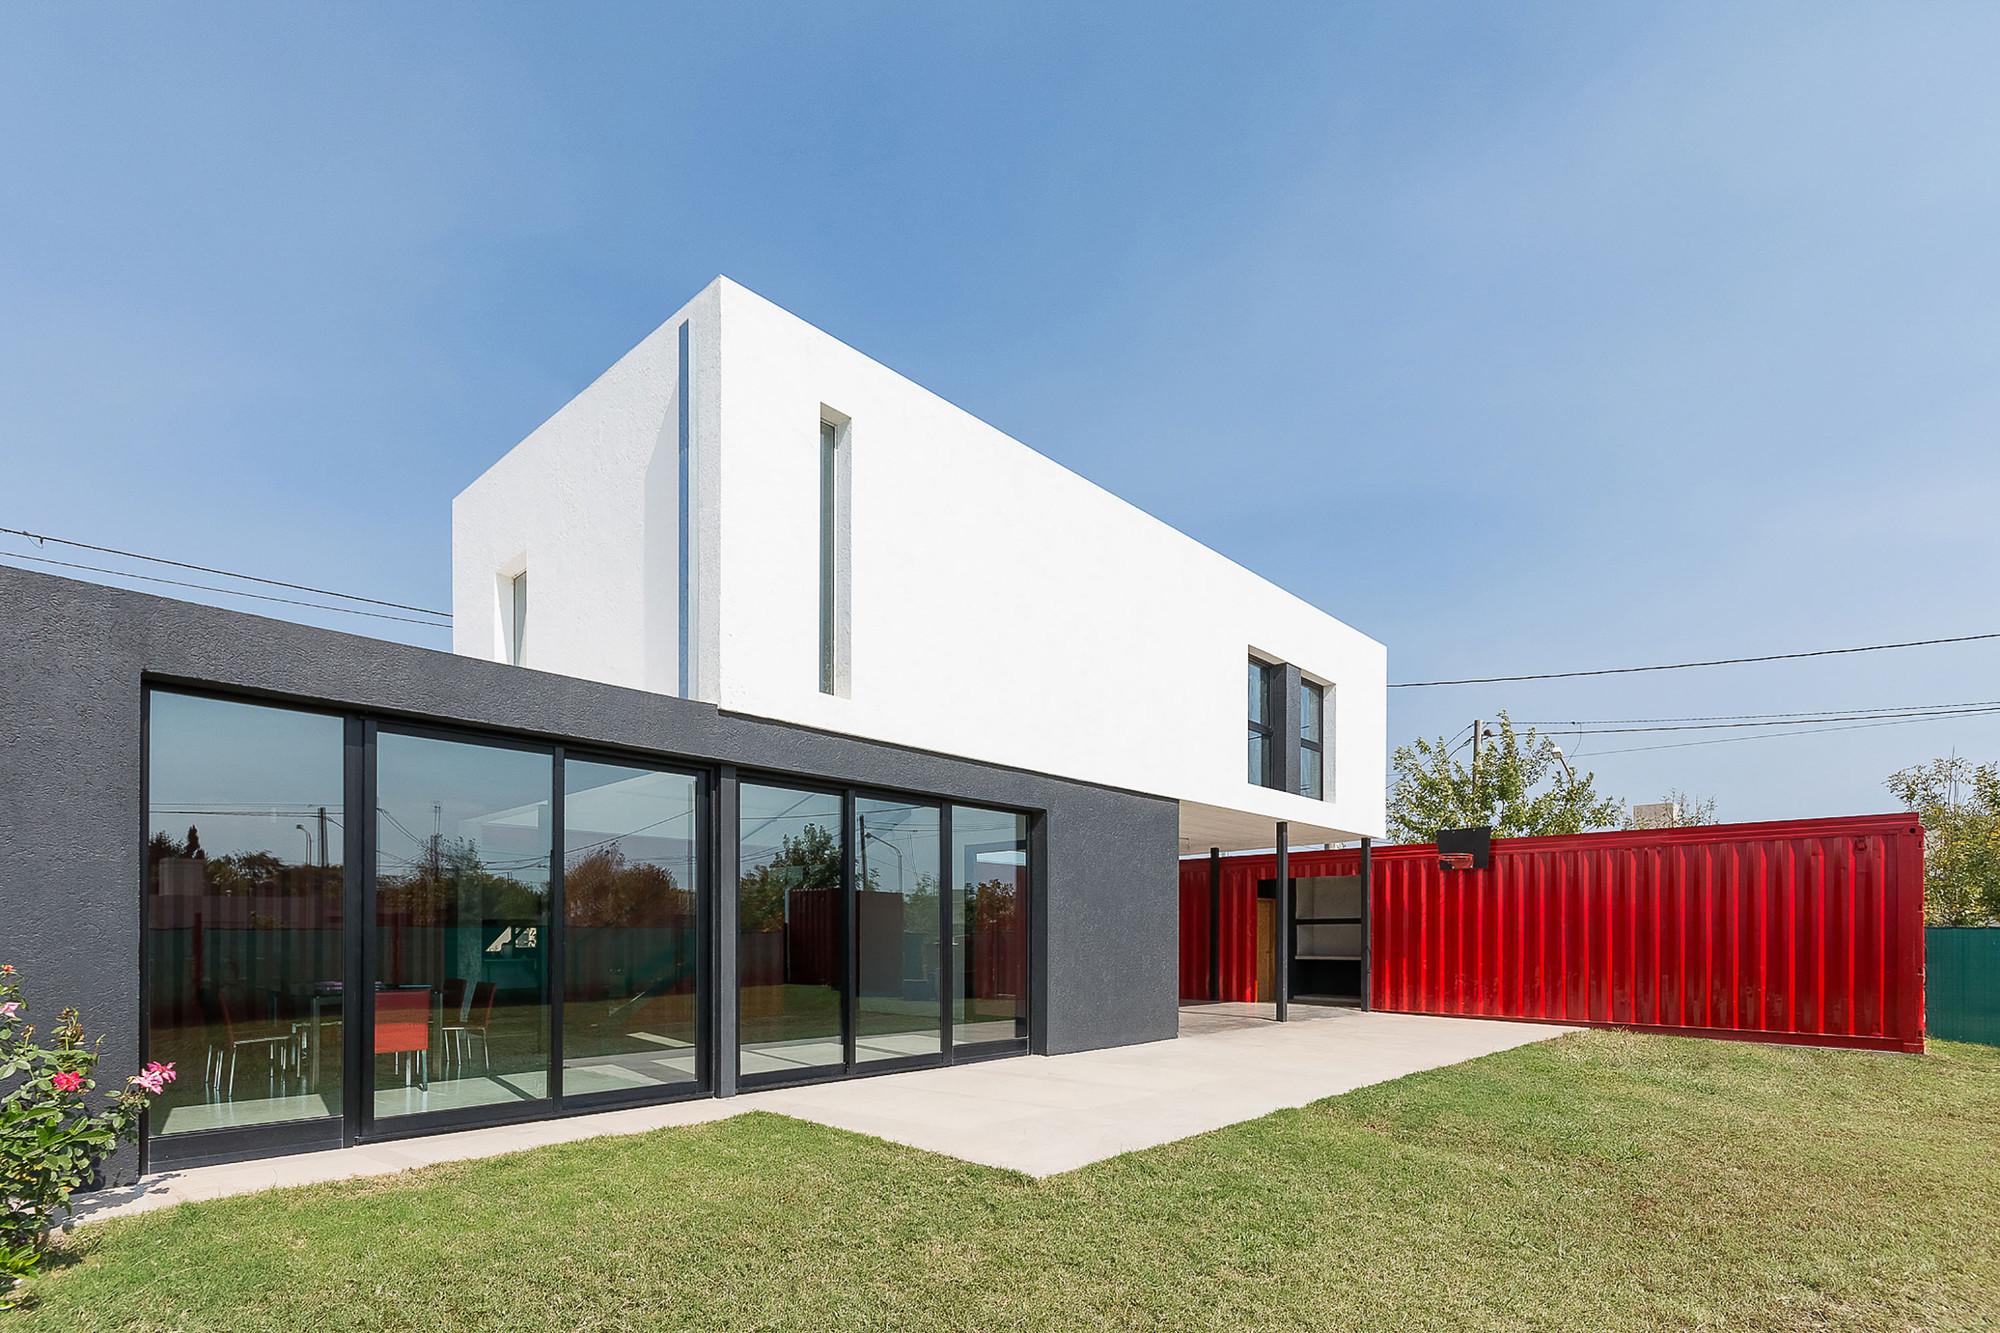 Excepcional Casa Container / José Schreiber Arquitecto | ArchDaily Brasil IZ79